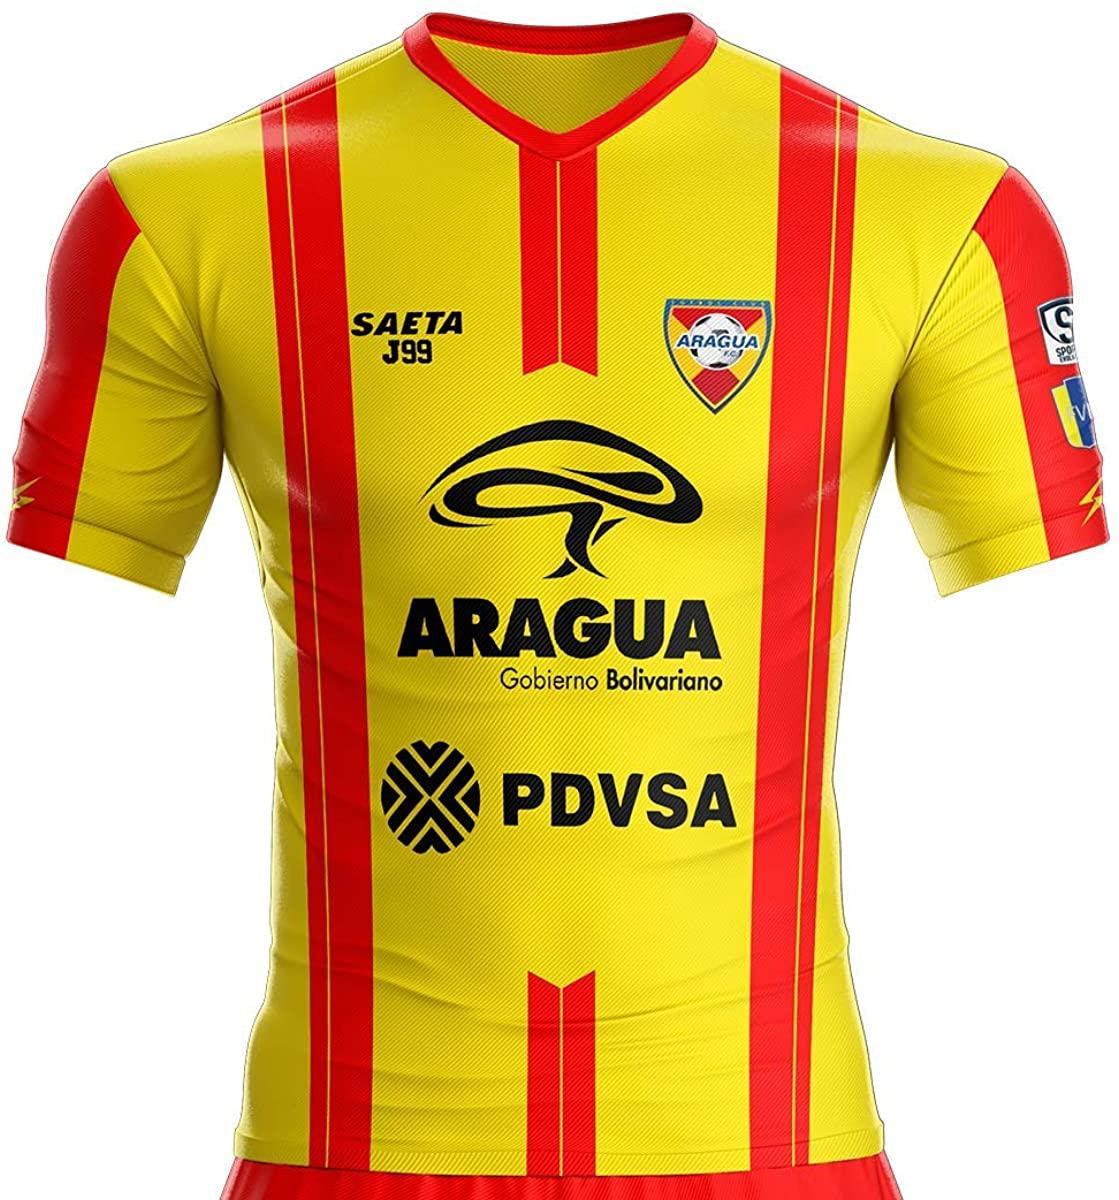 Aragua (Venezuela) Home Soccer Jersey